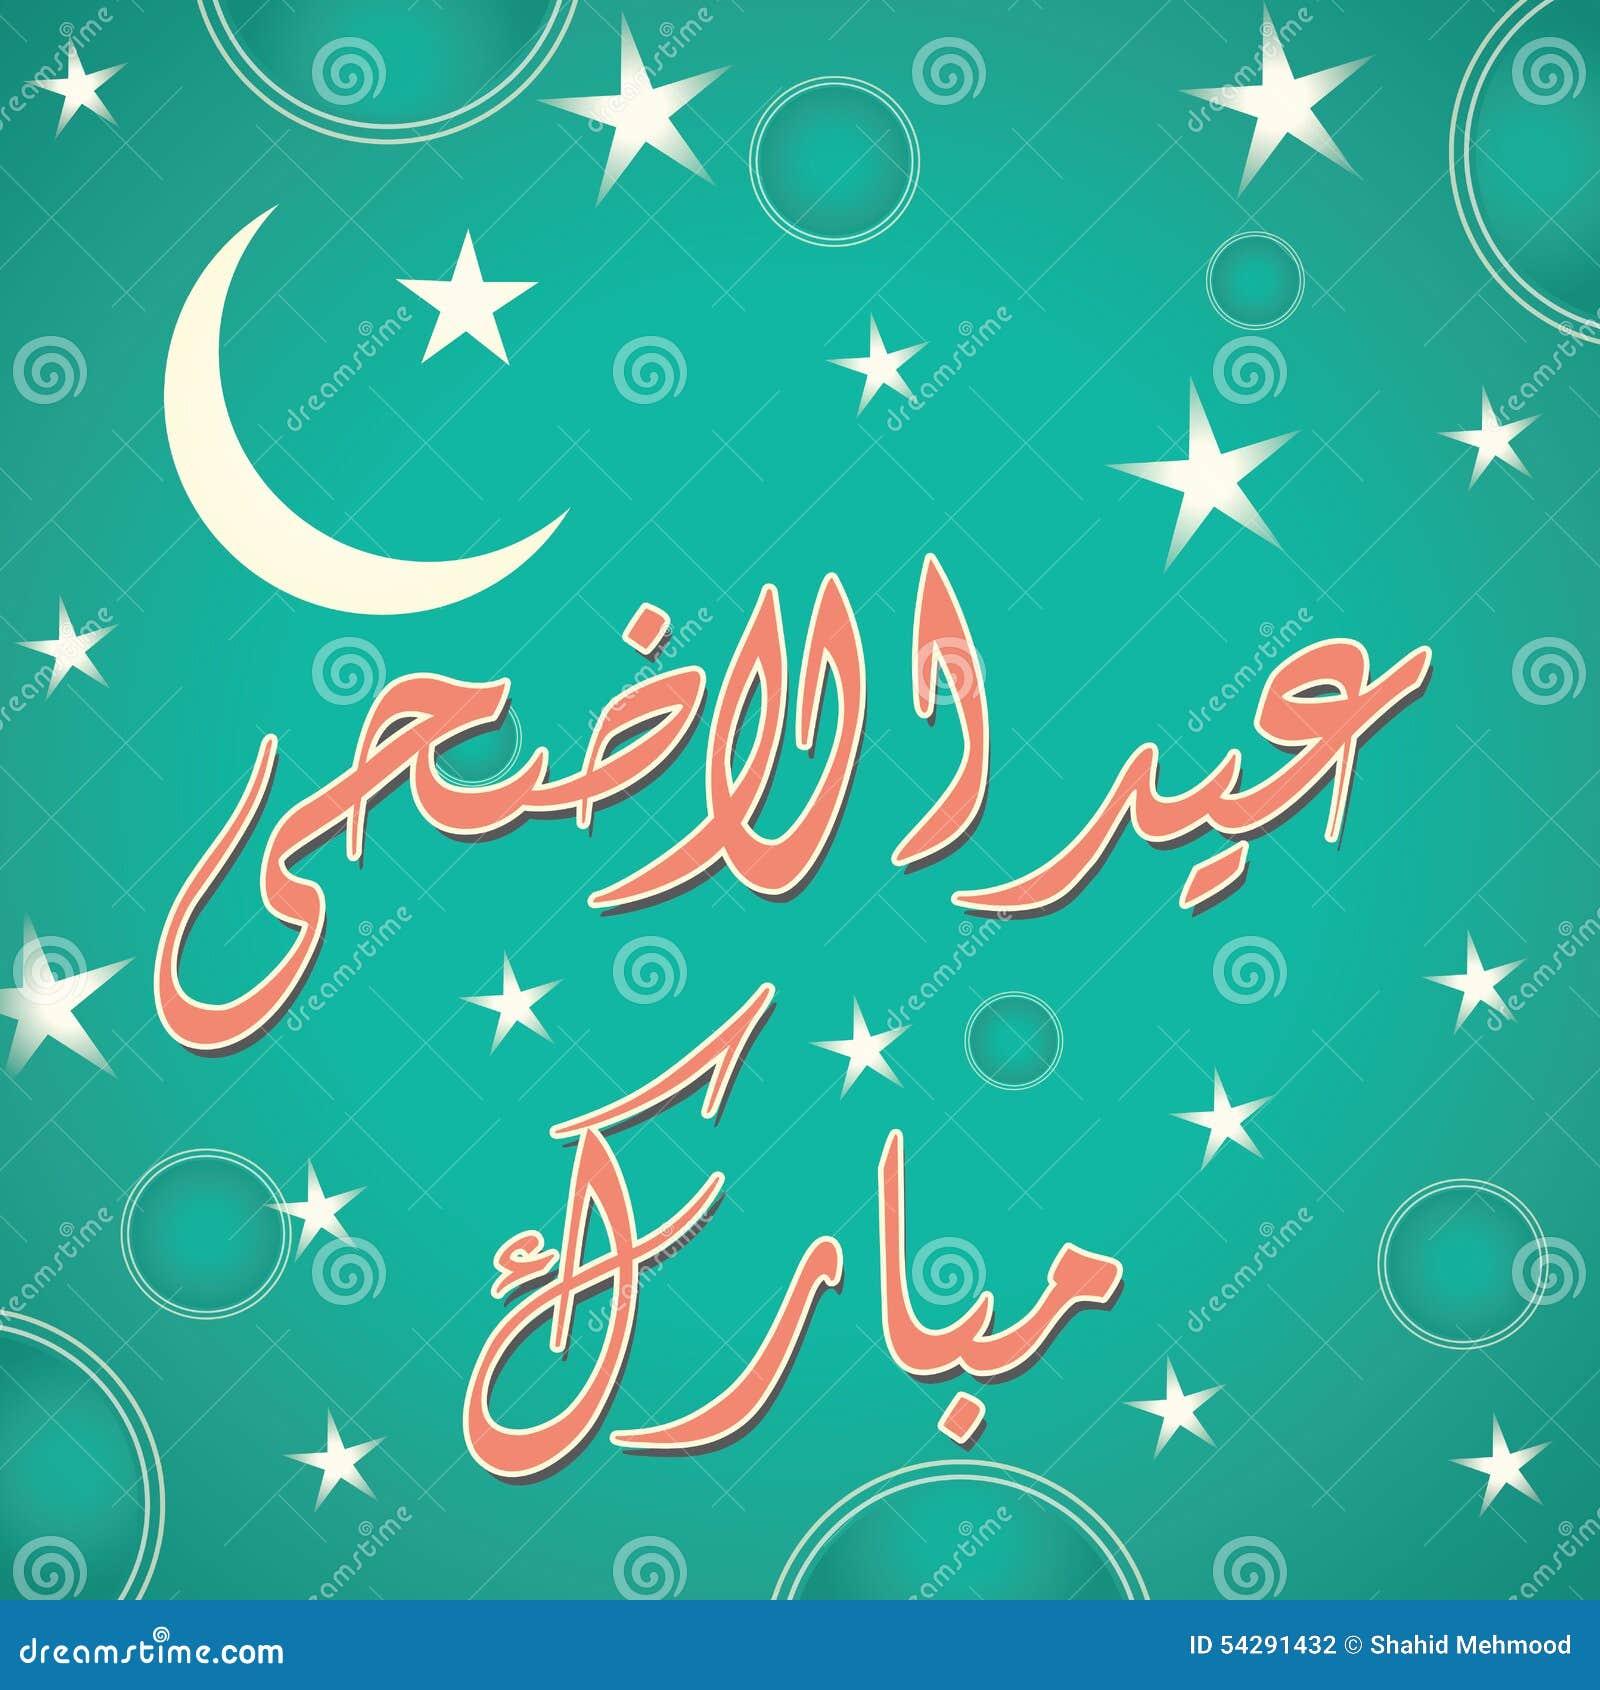 Urdu Arabic Islamic Calligraphy Of Text Eid Ul Adha